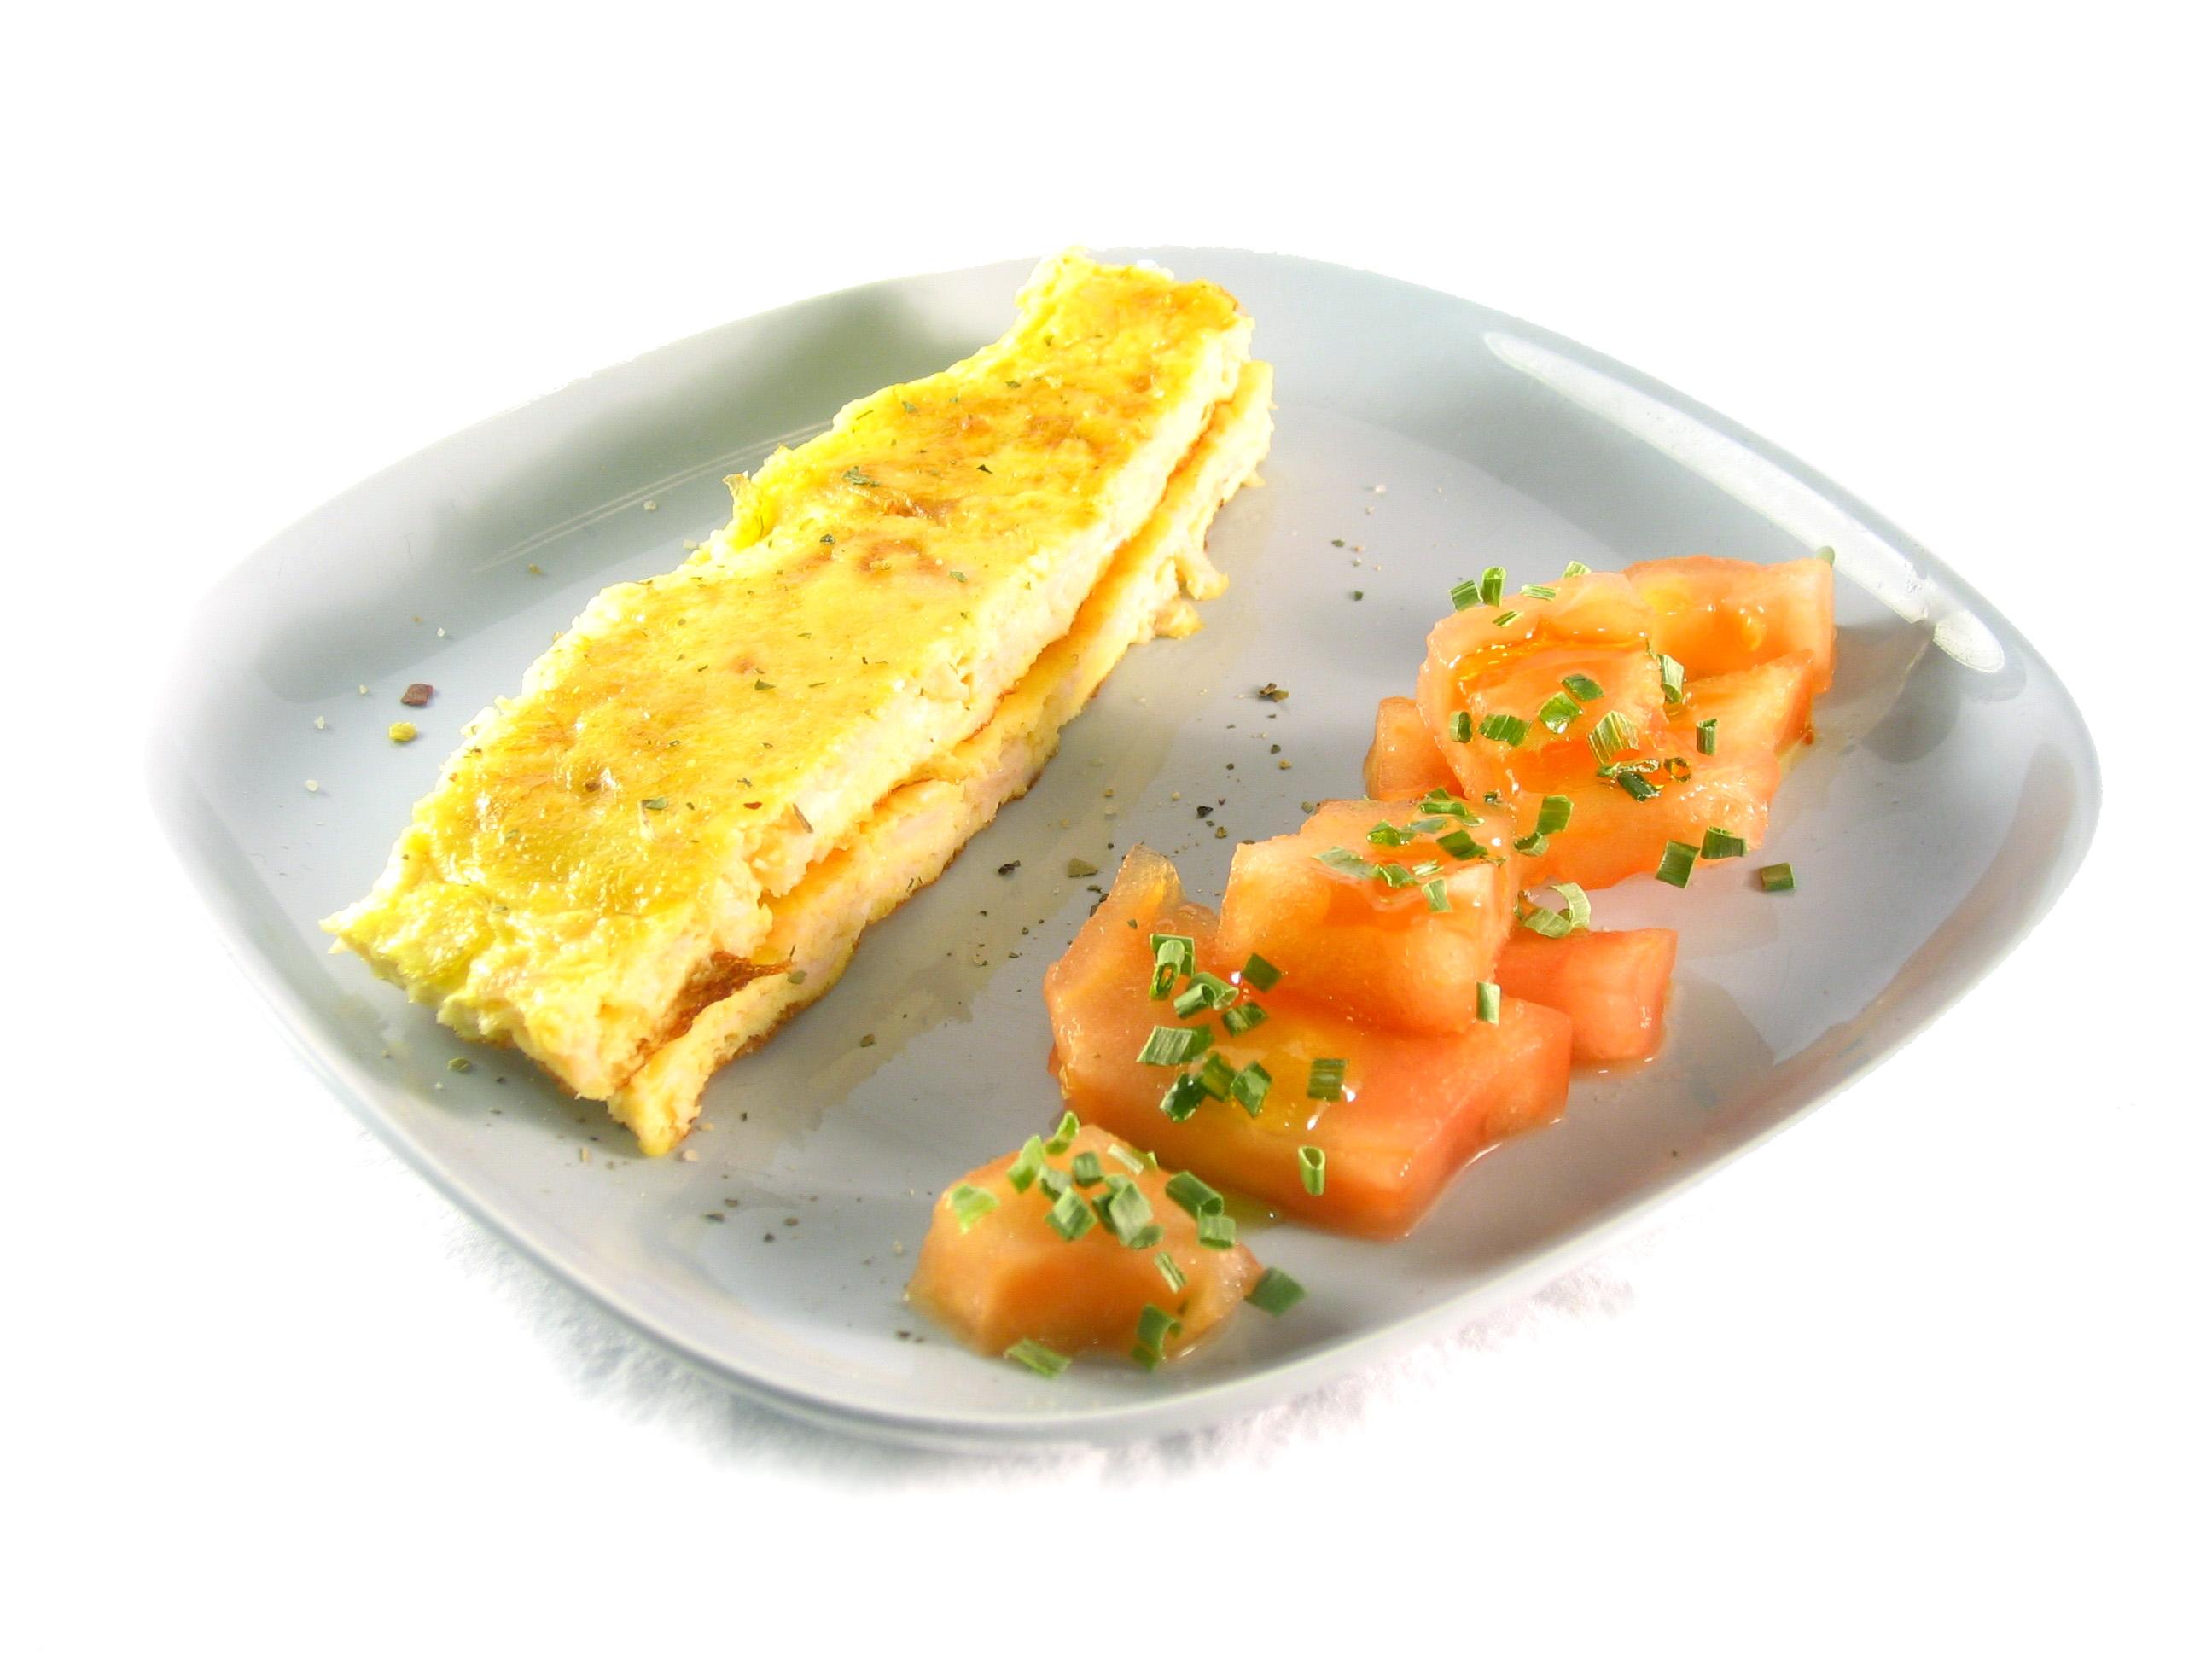 Receta de tortilla de pechuga de pavo EROSKI Sannia  y queso emmental EROSKI